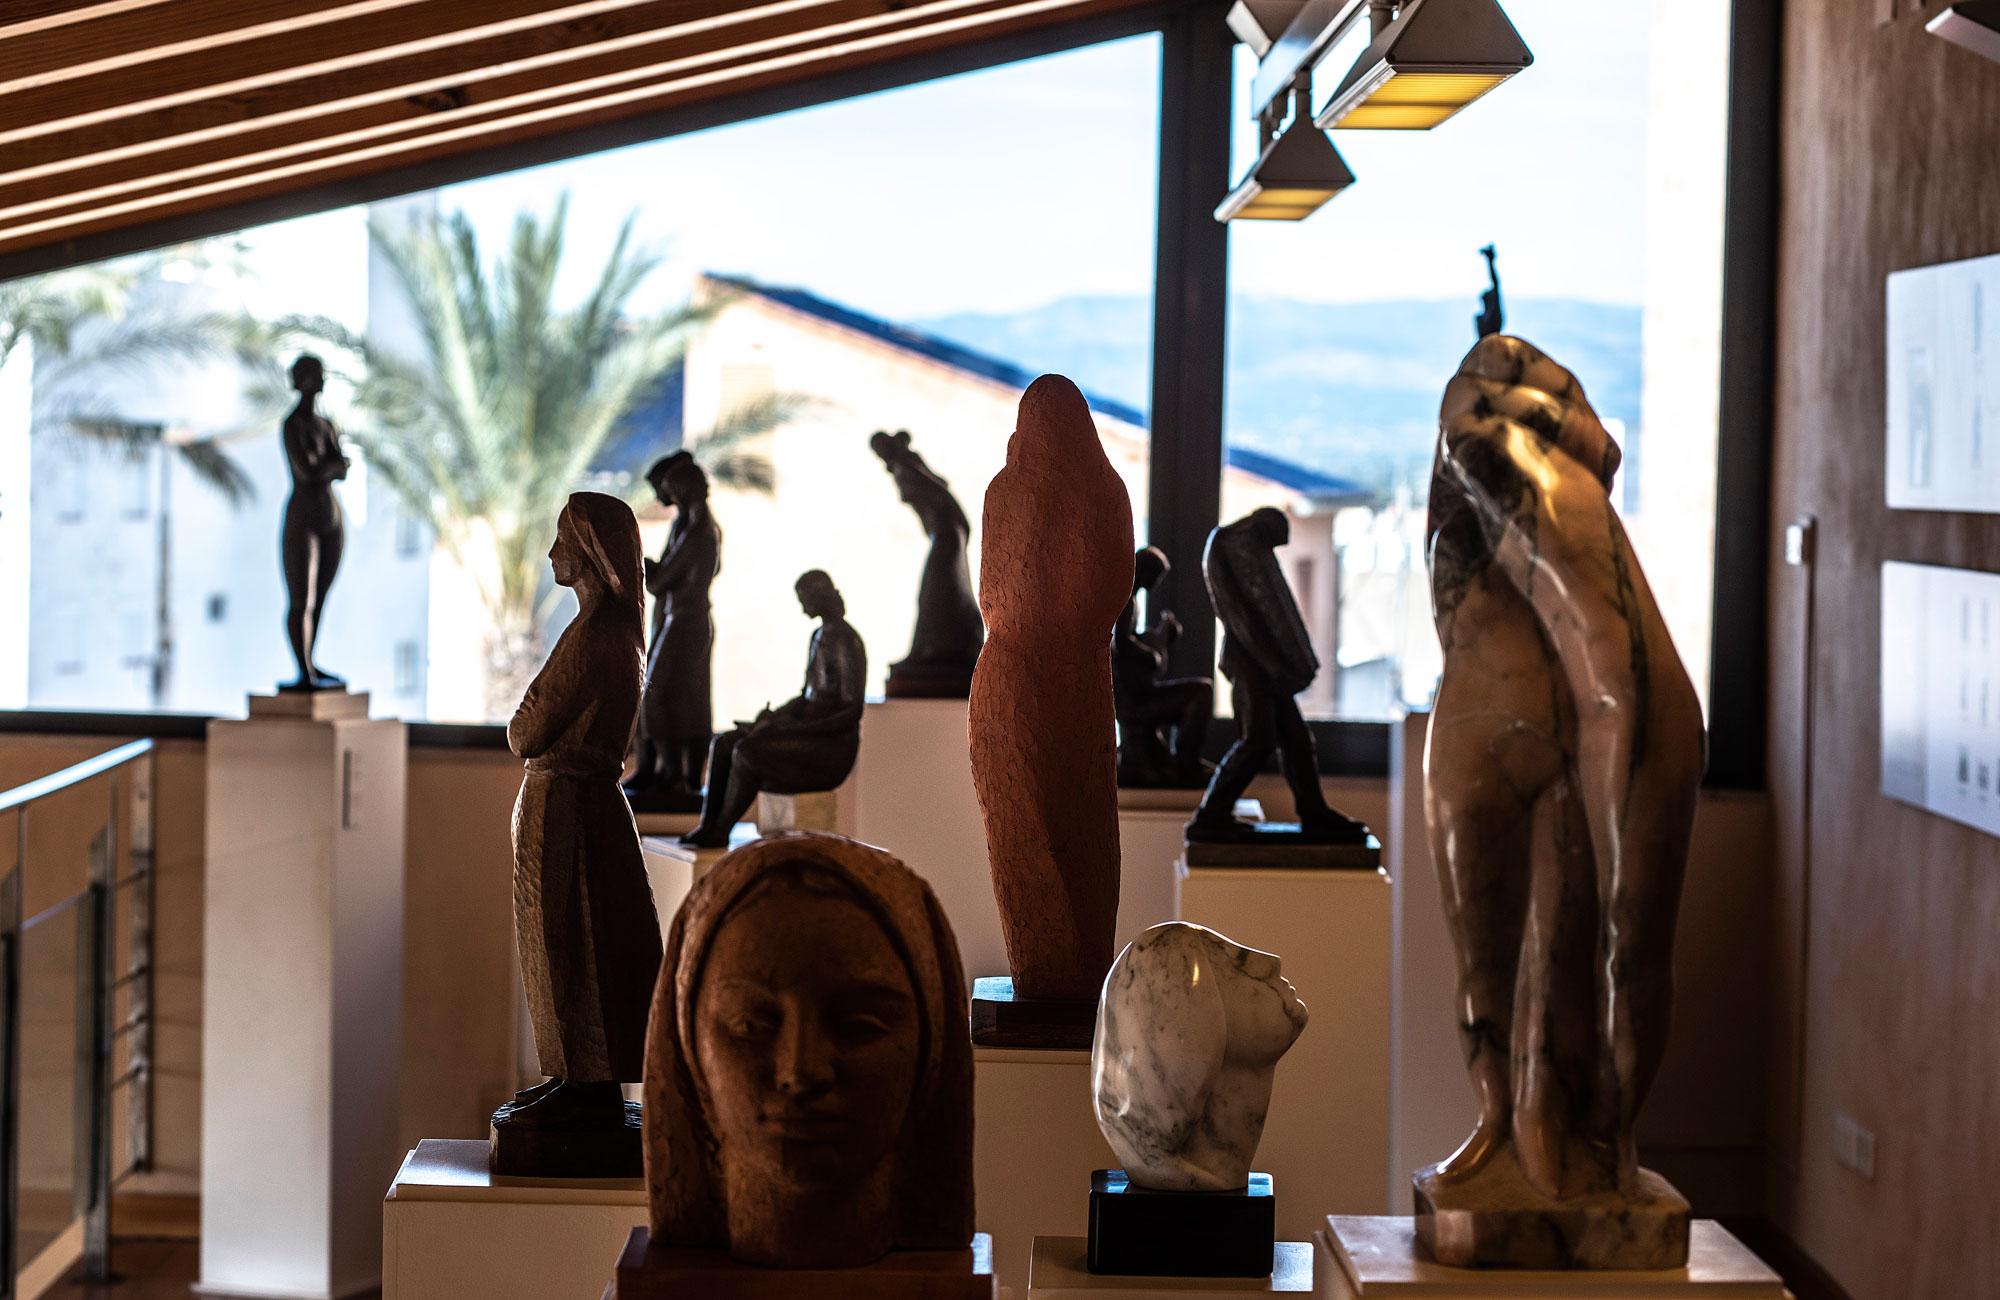 Turisme Lliria - Museu Silvestre d'Edeta - planta superior